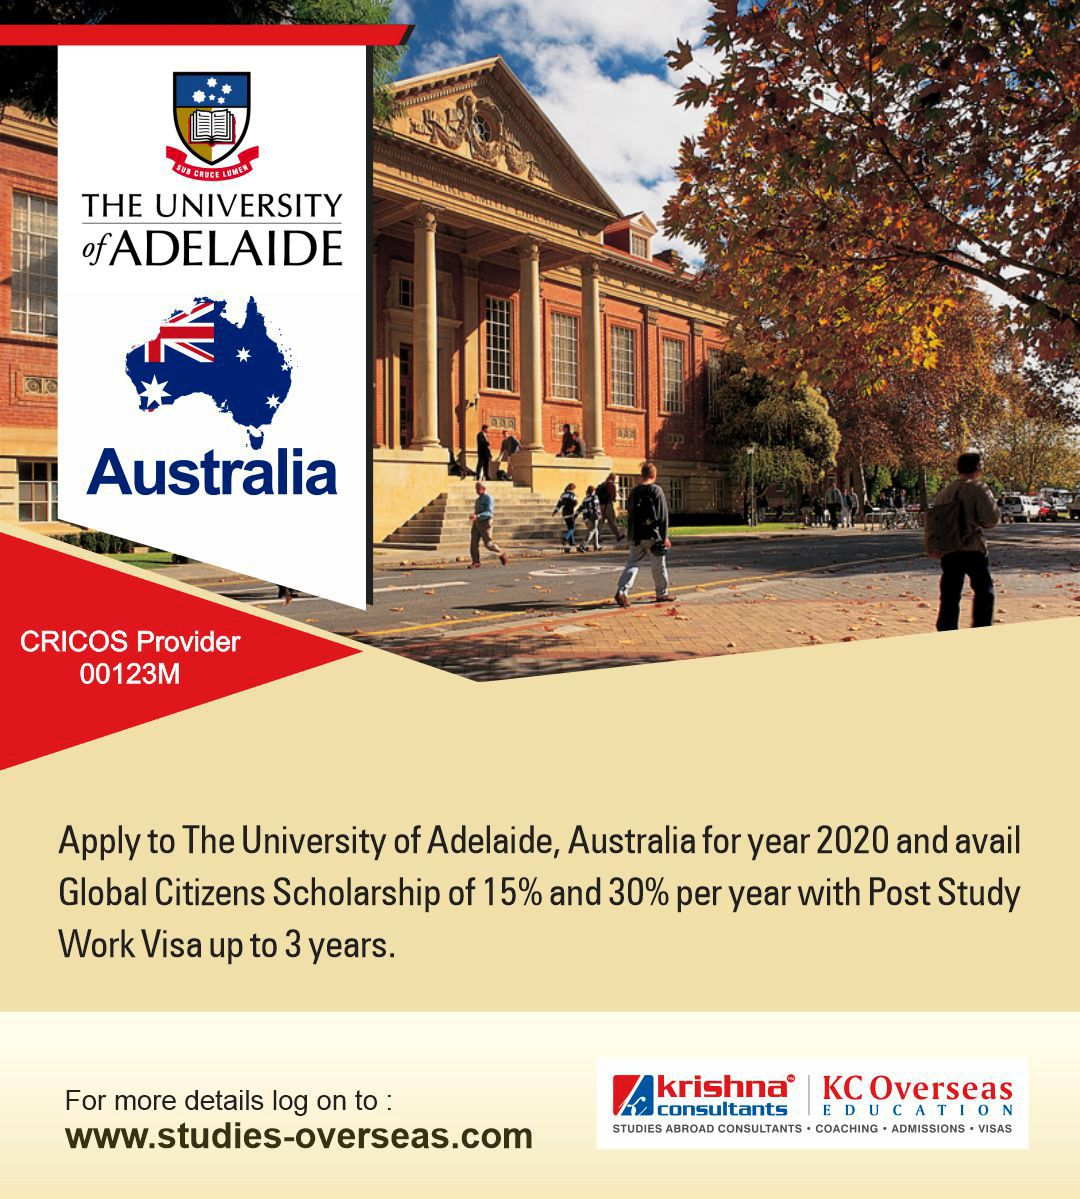 63b9a189fa00398f5b79ef2725d3e9c0 - Australian University Application Deadline 2020